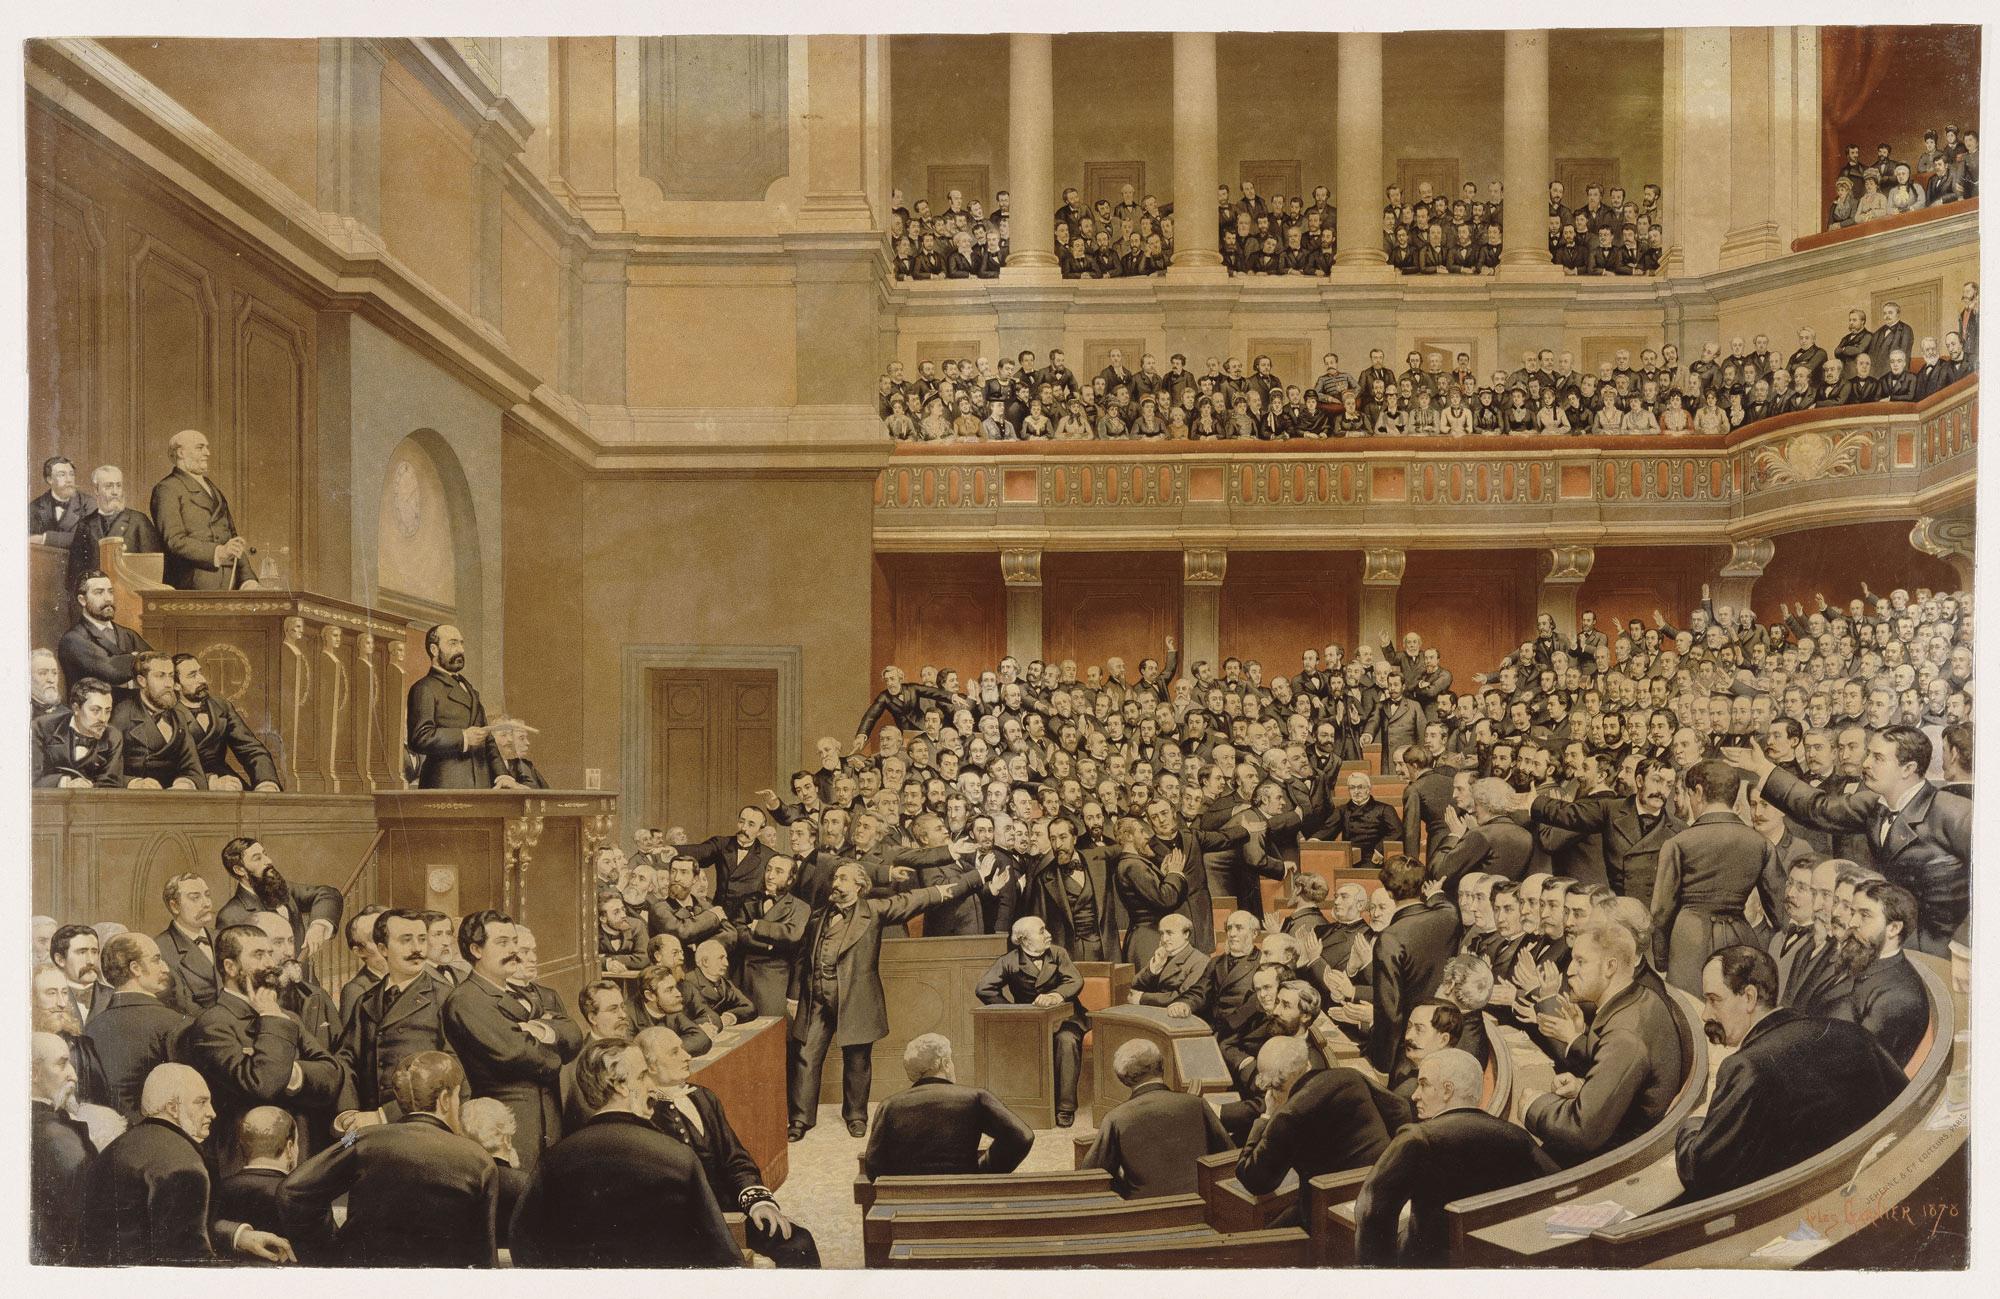 1875-1876 - XIXth century - Over the centuries - Versailles 3d f2e809cb0b3